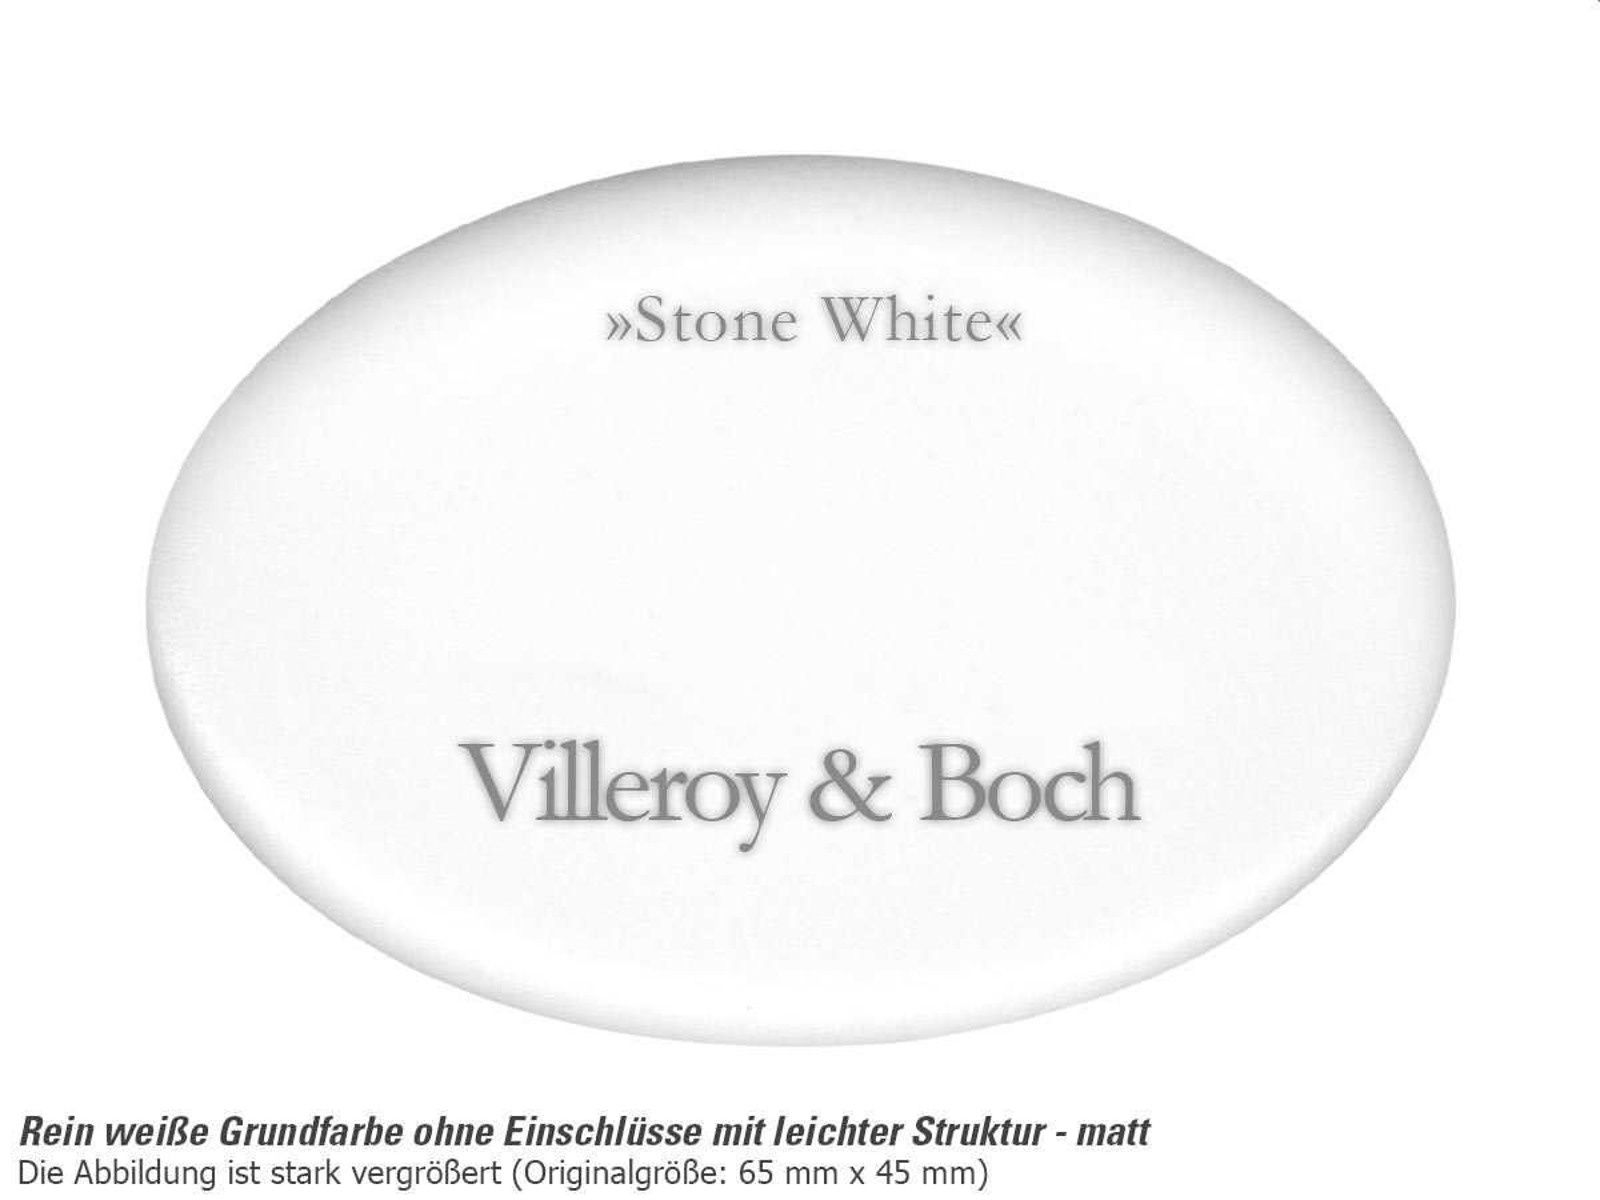 Villeroy & Boch Subway 45 XS Stone White - 6781 01 RW Keramikspüle Handbetätigung